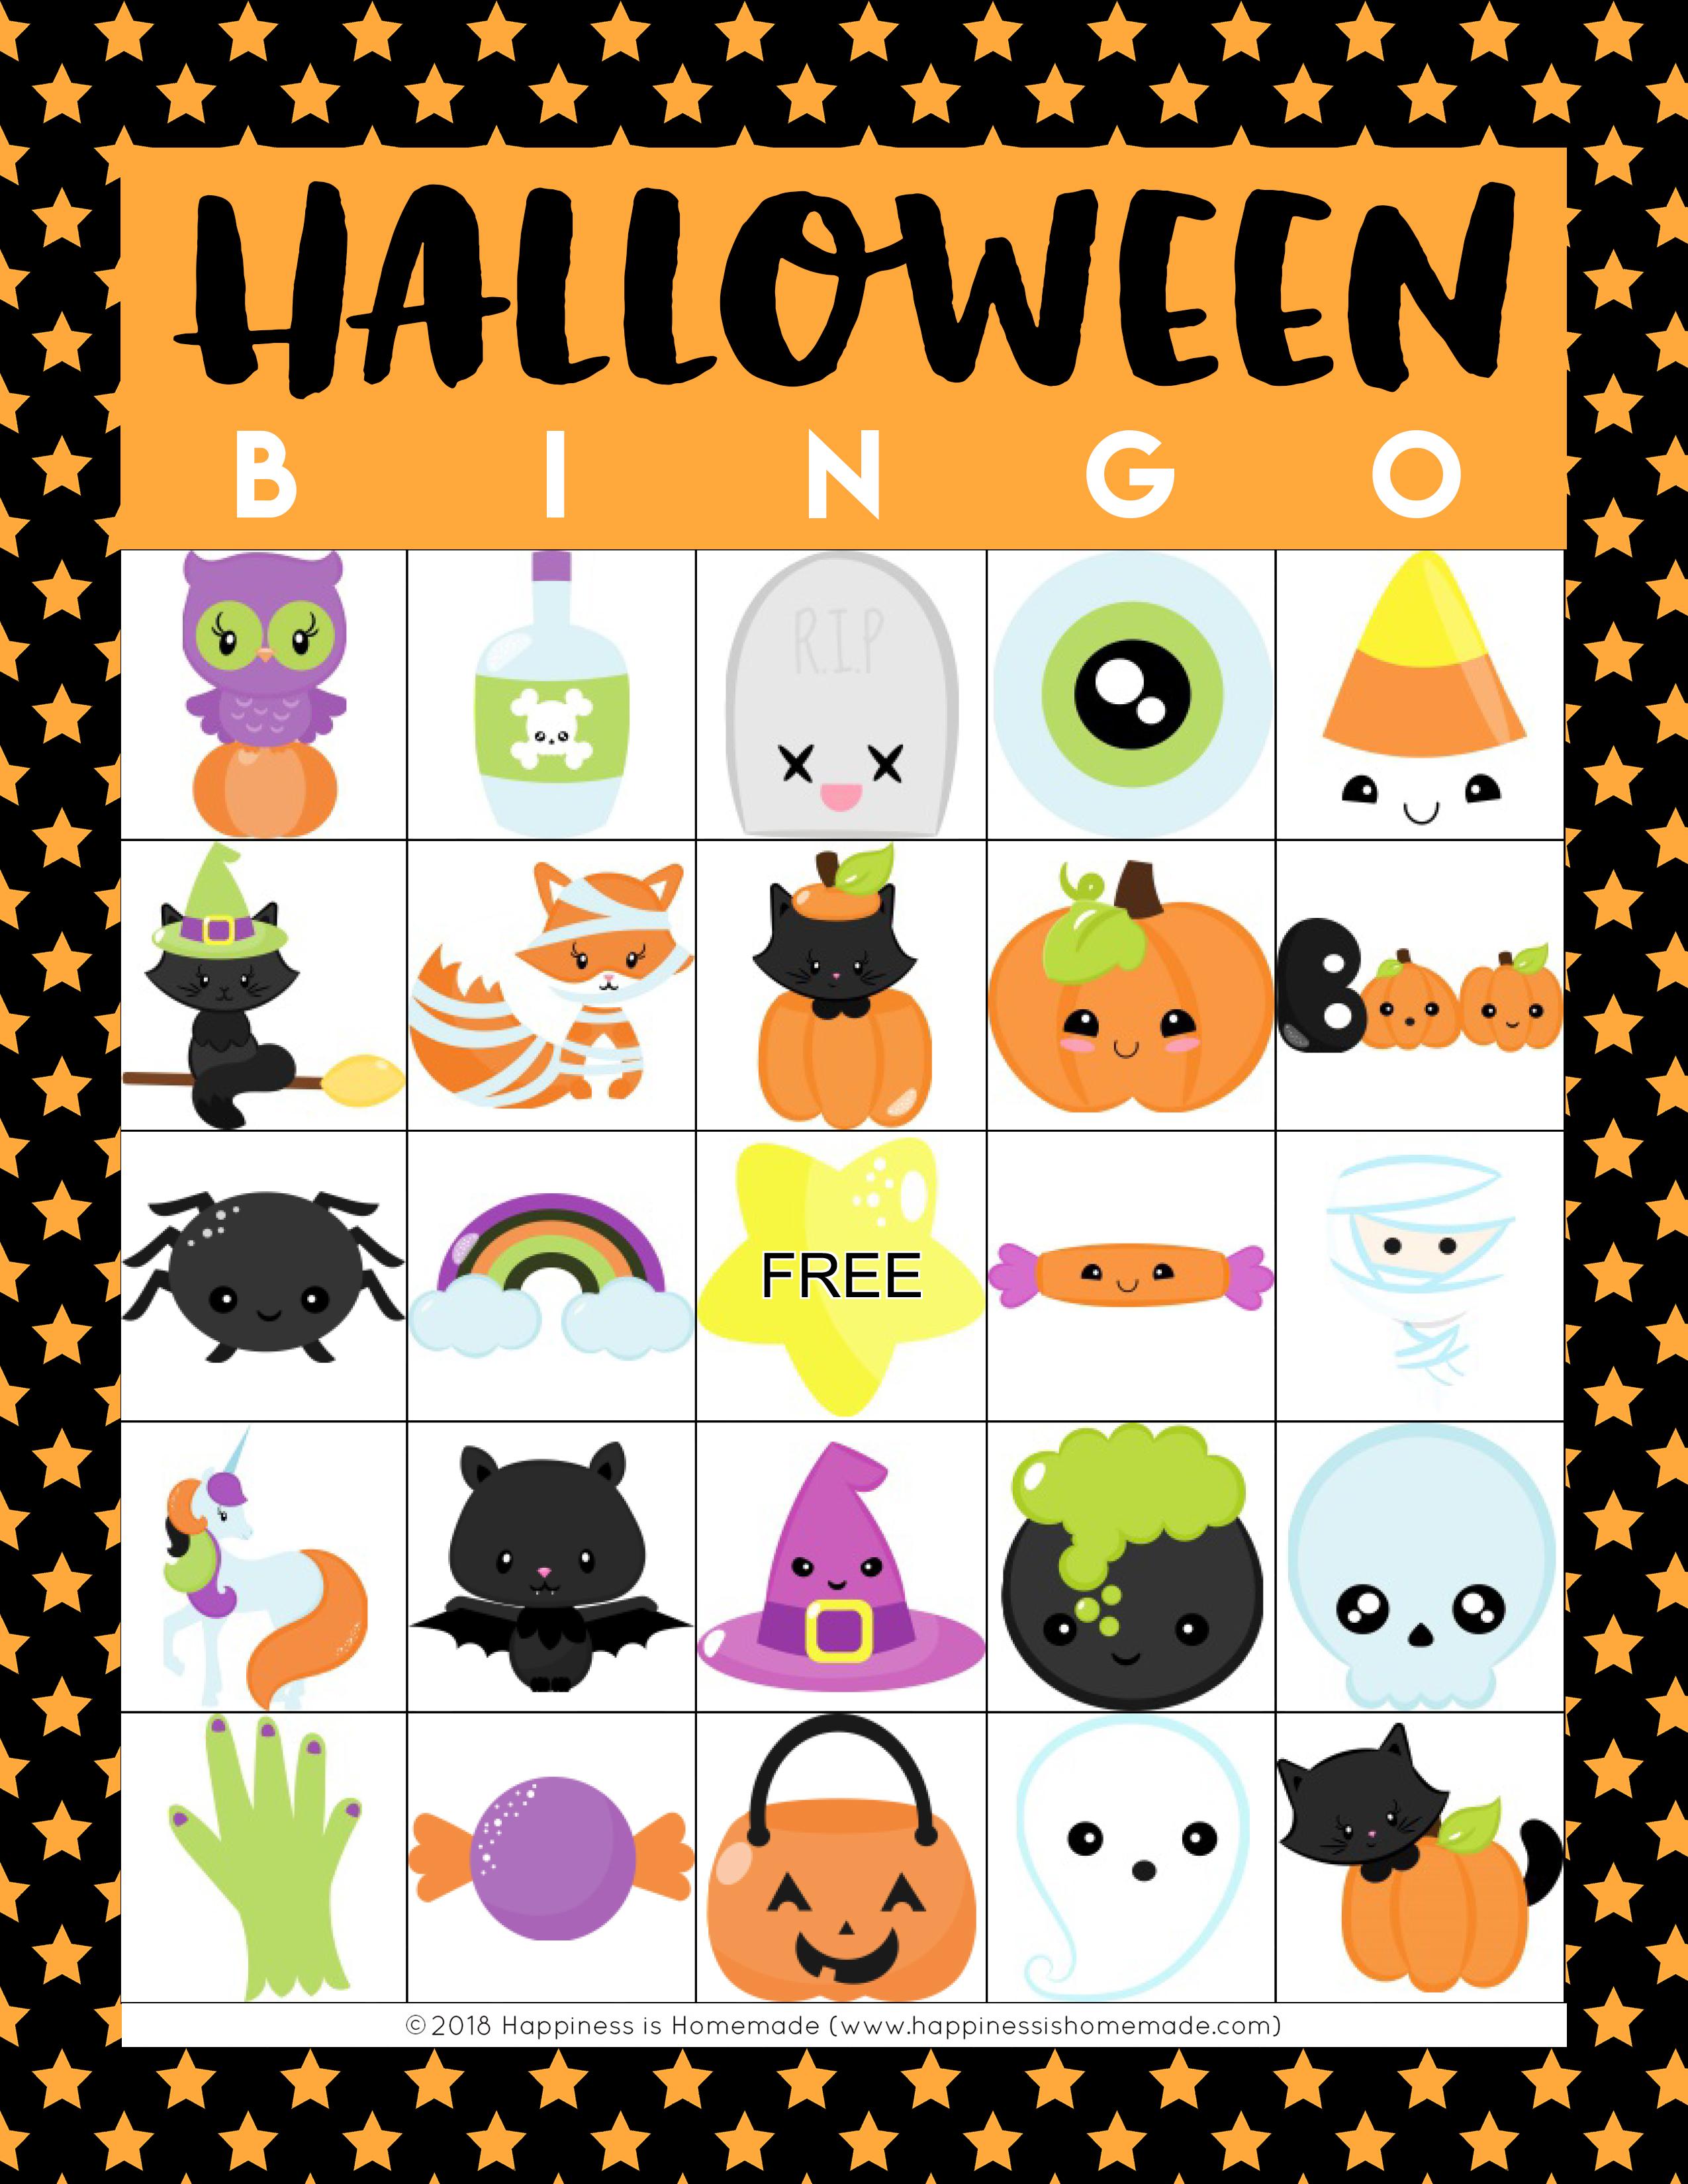 Free Printable Halloween Bingo Cards With Pictures.Printable Halloween Bingo Game Cards Happiness Is Homemade